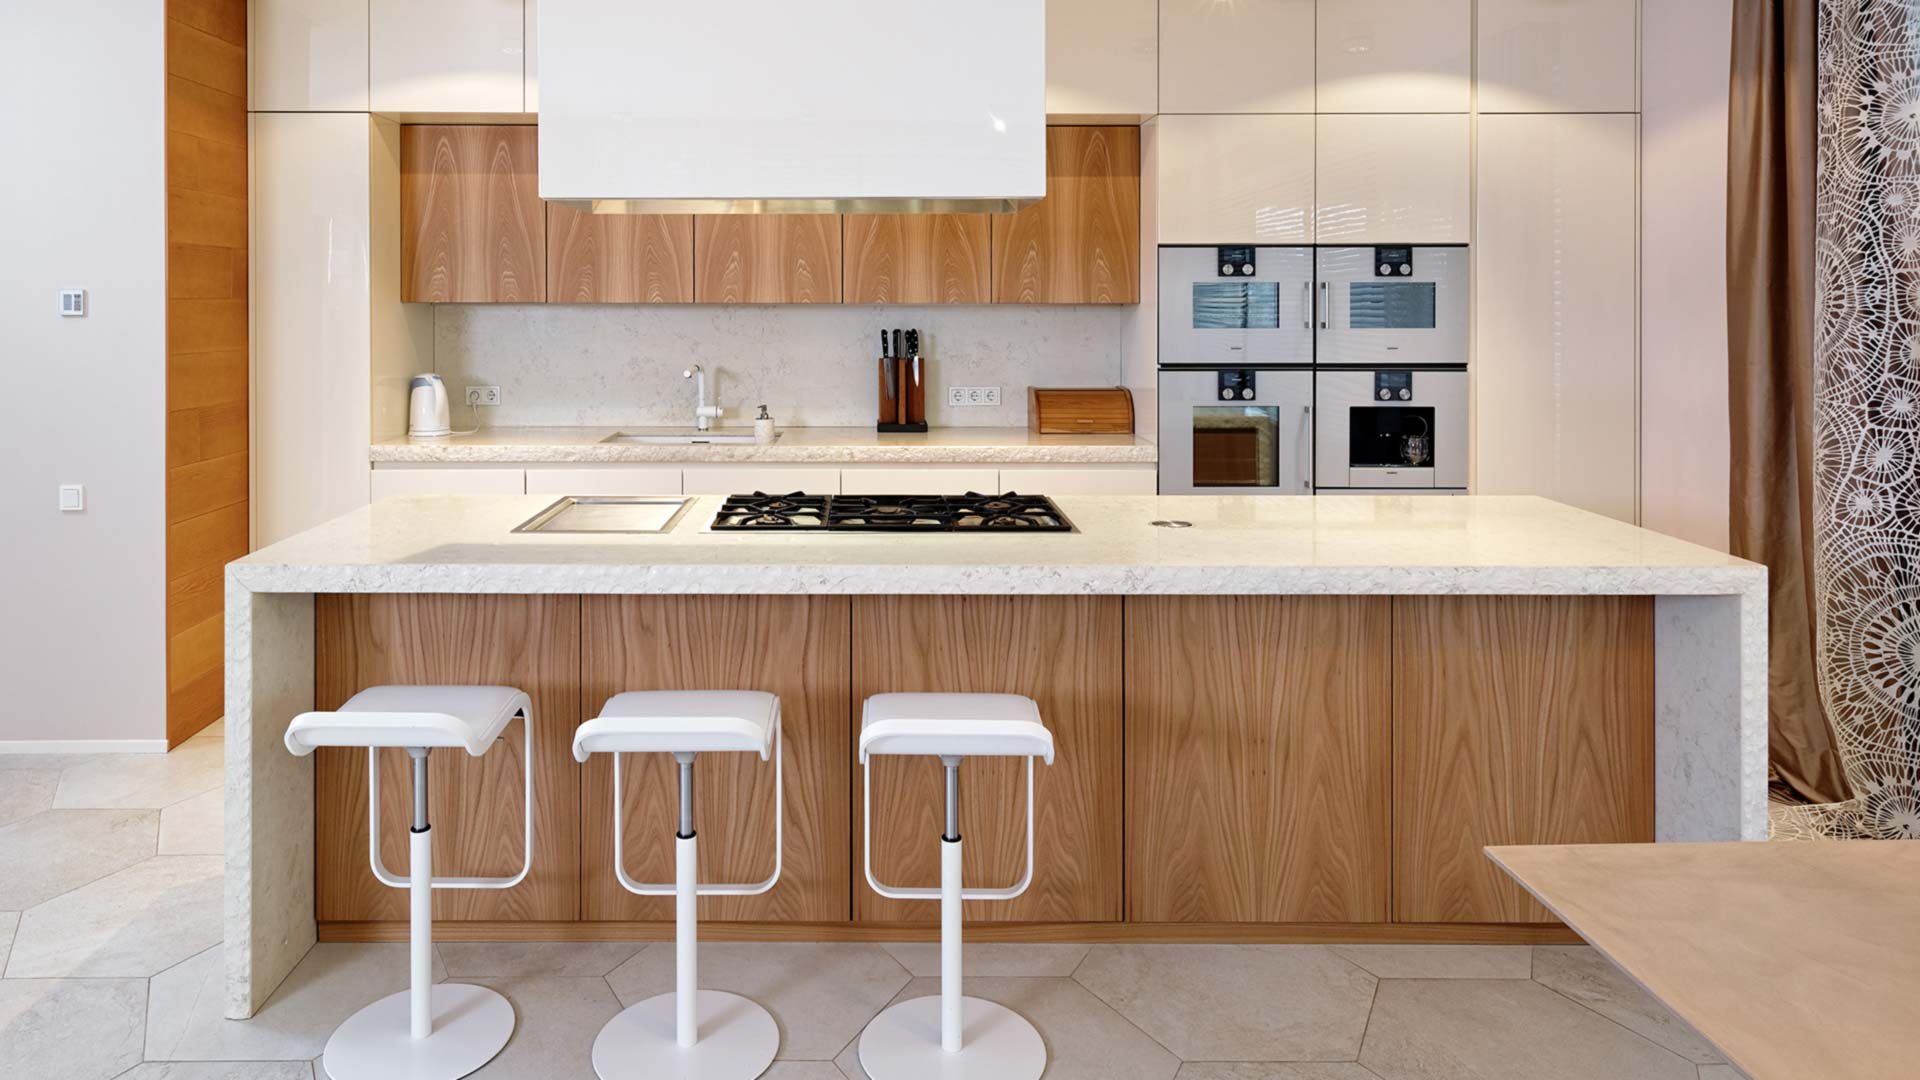 Cucina in pietra e olmo con isola freestanding